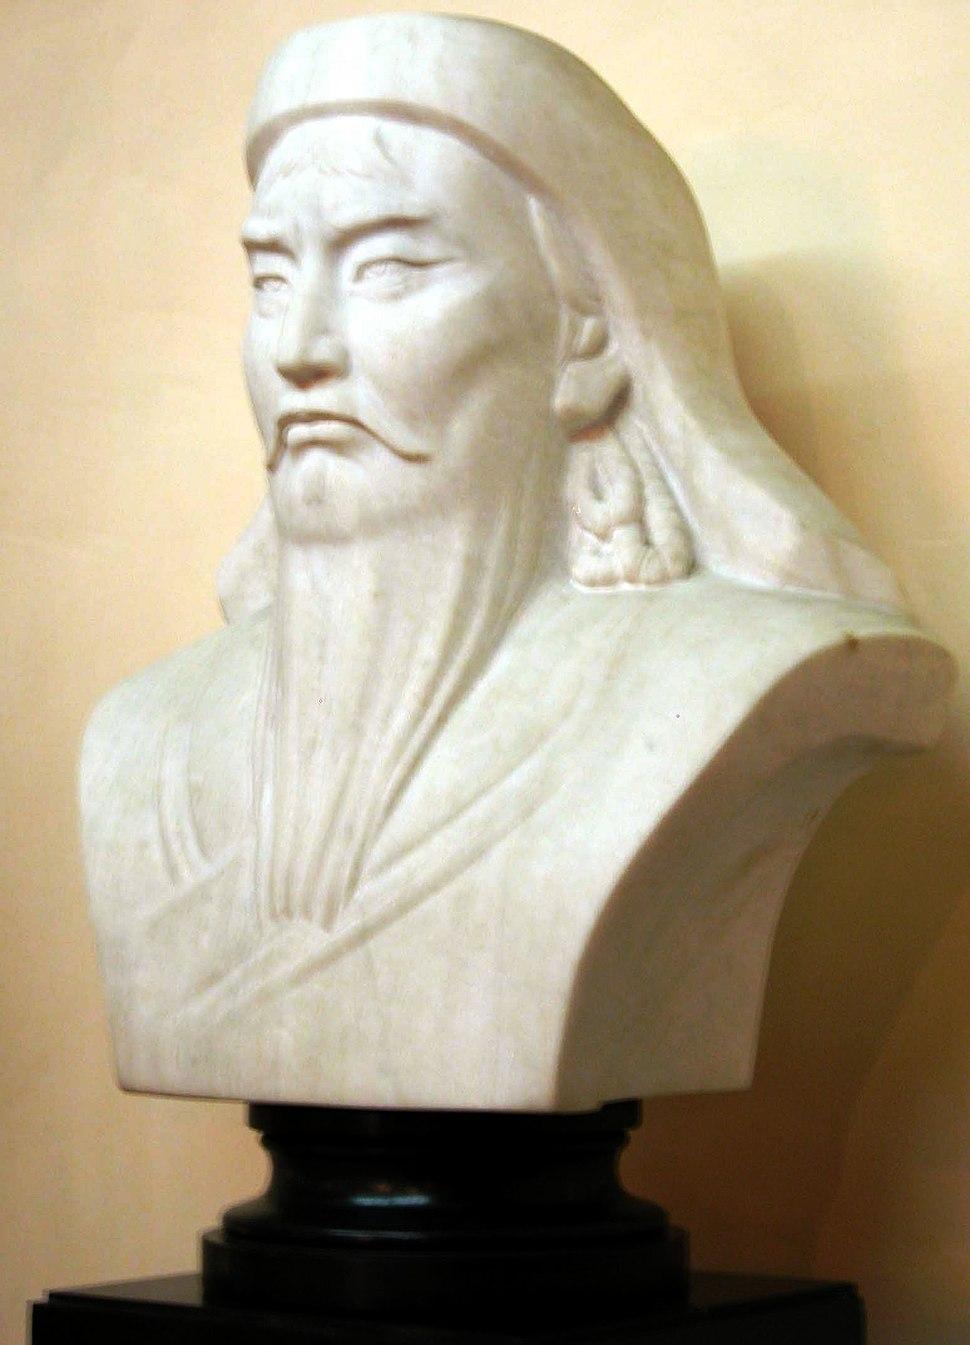 Bust of Genghis Khan in Mongolia